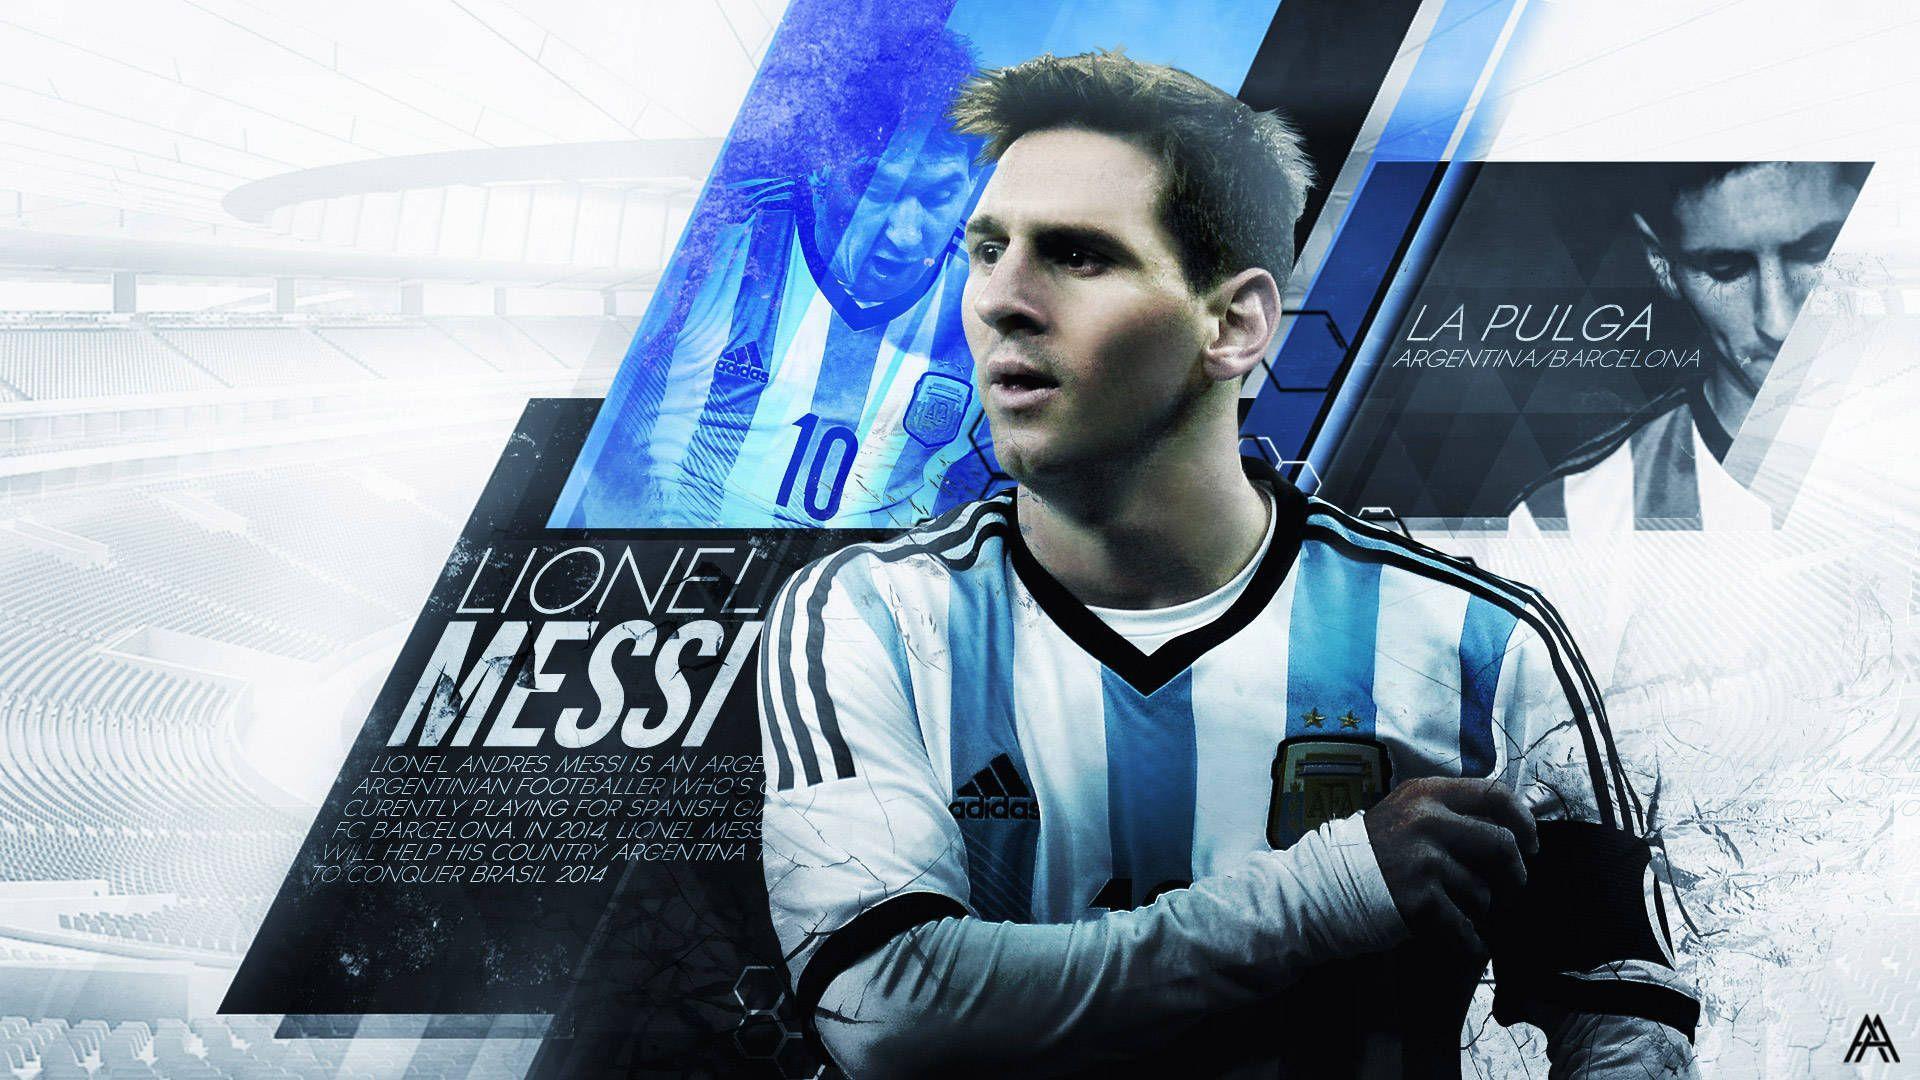 Messi Desktop Background | HD Wallpapers, Backgrounds, Images, Art ...